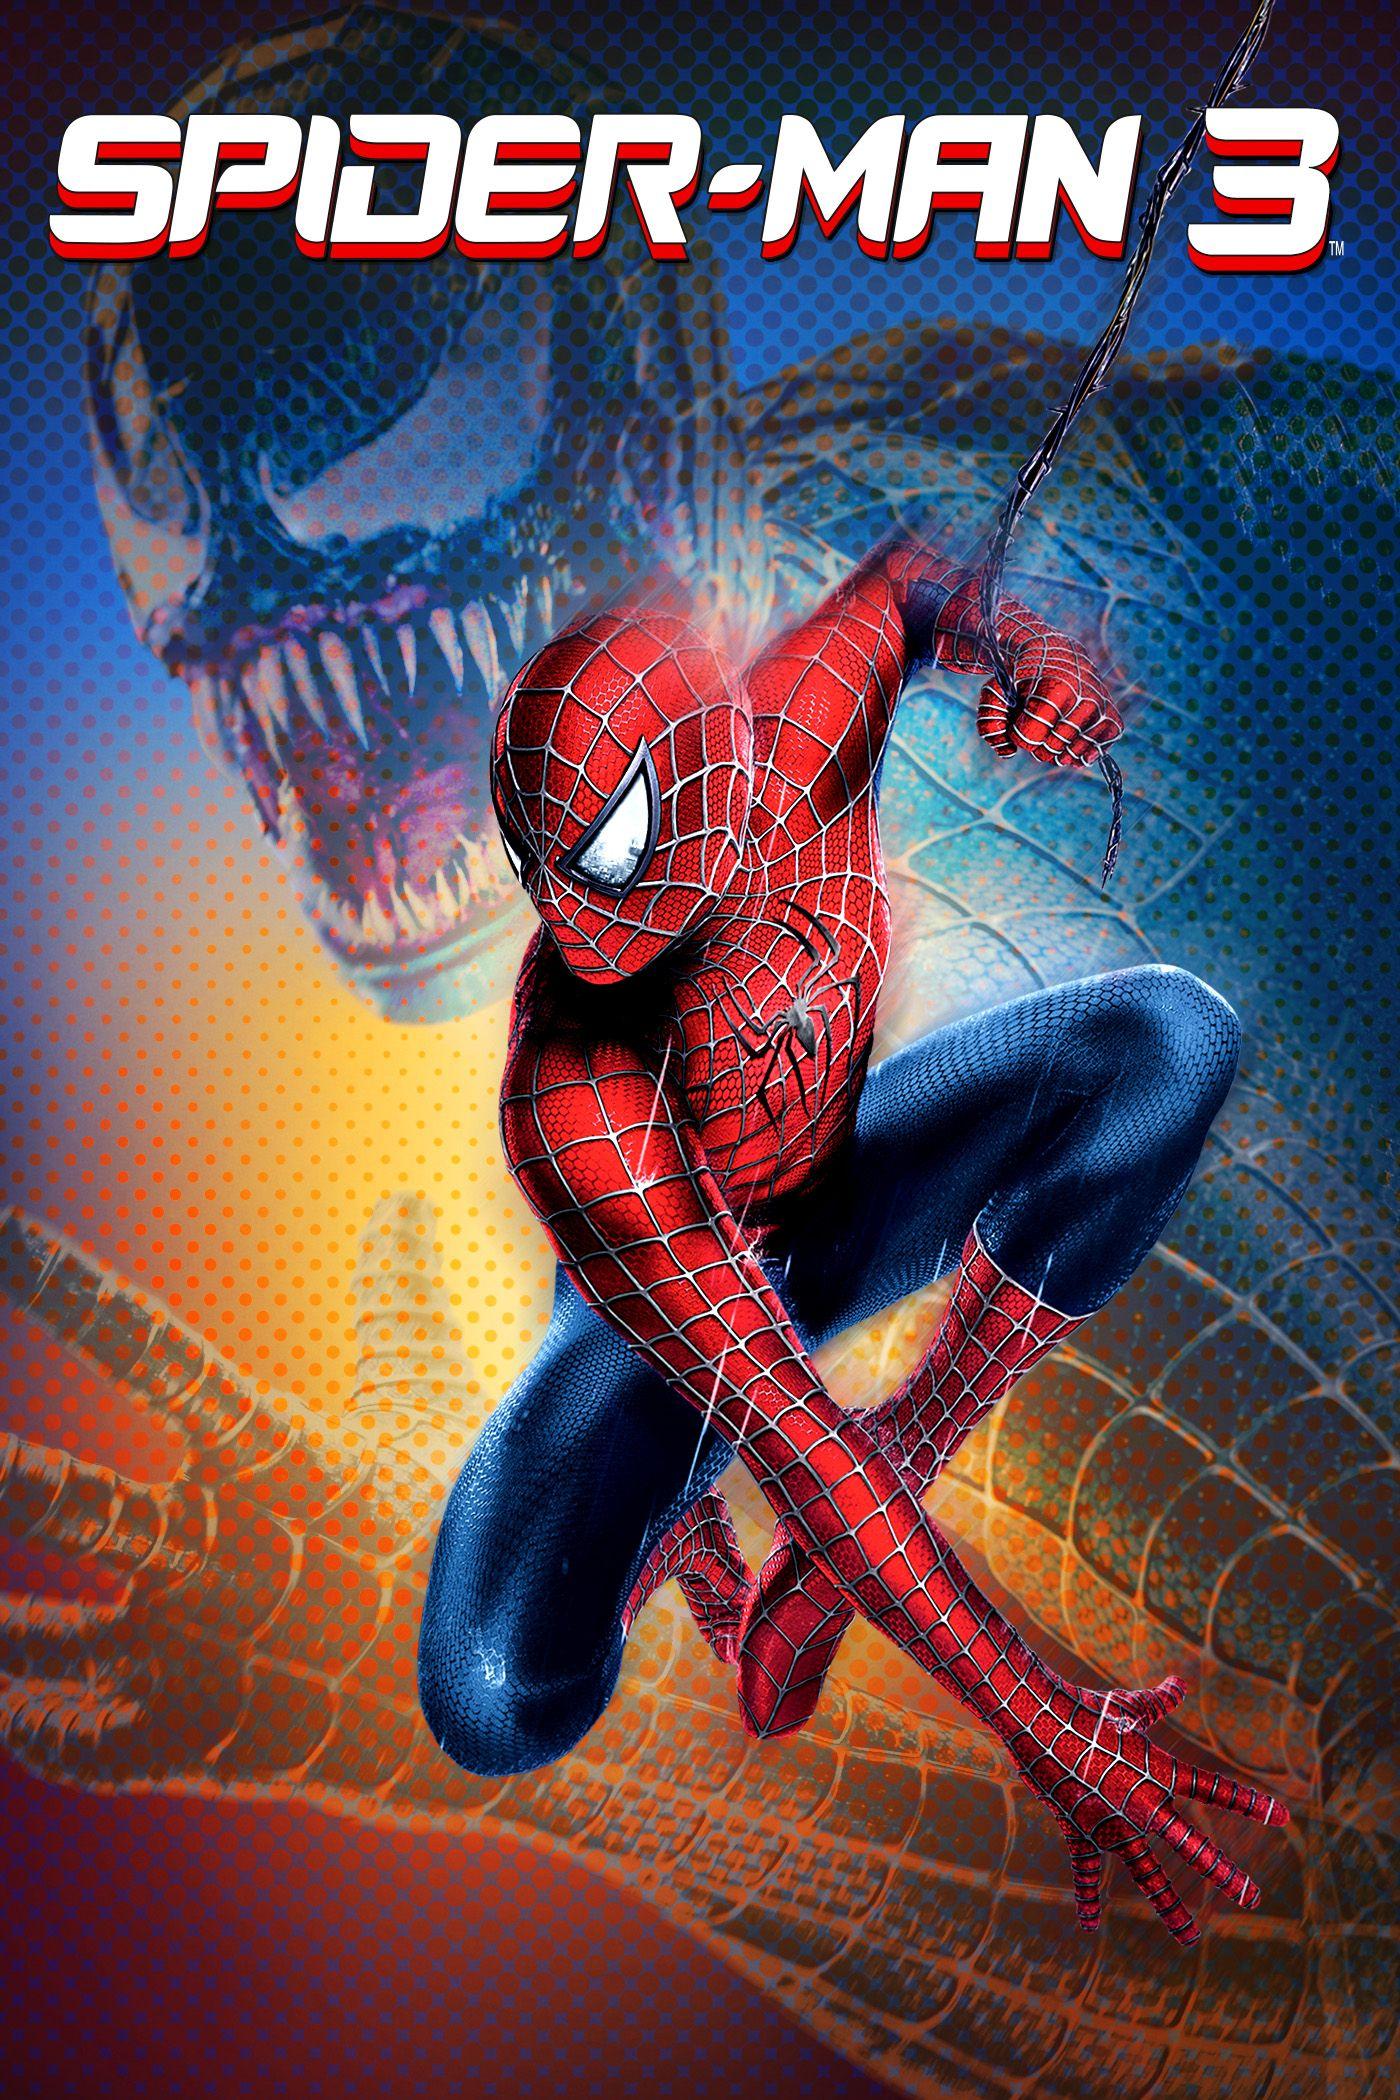 Spider-Man 3 | Full Movie | Movies Anywhere